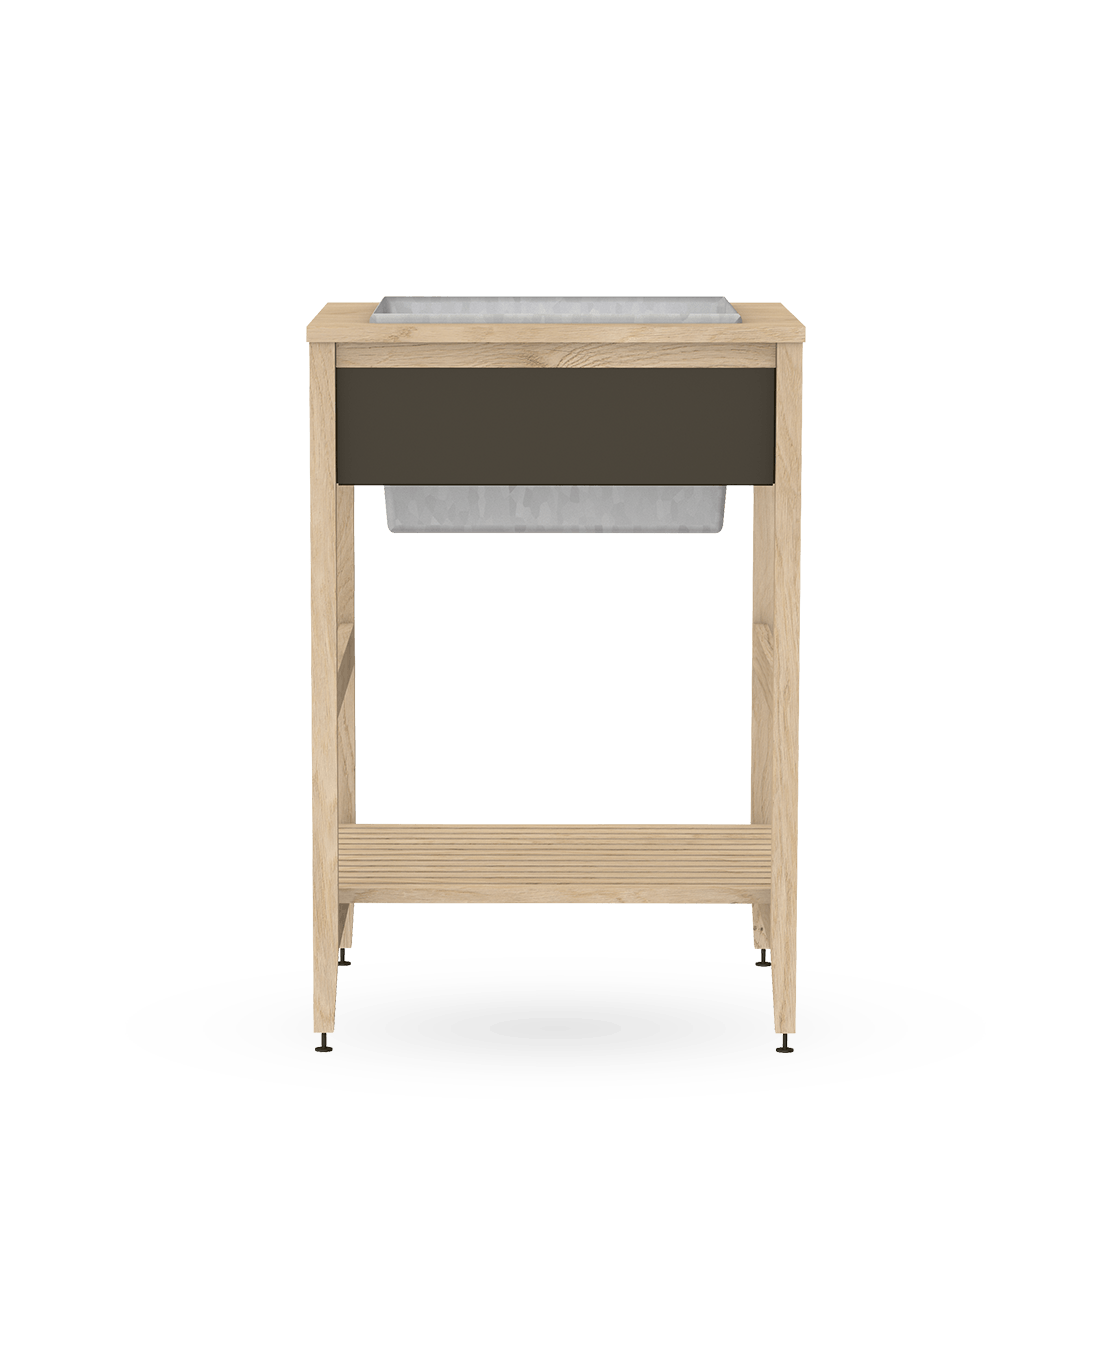 coquo white oak solid wood modular cabinet urban planter 24 inch C1-EXT-24SB-0011-NA